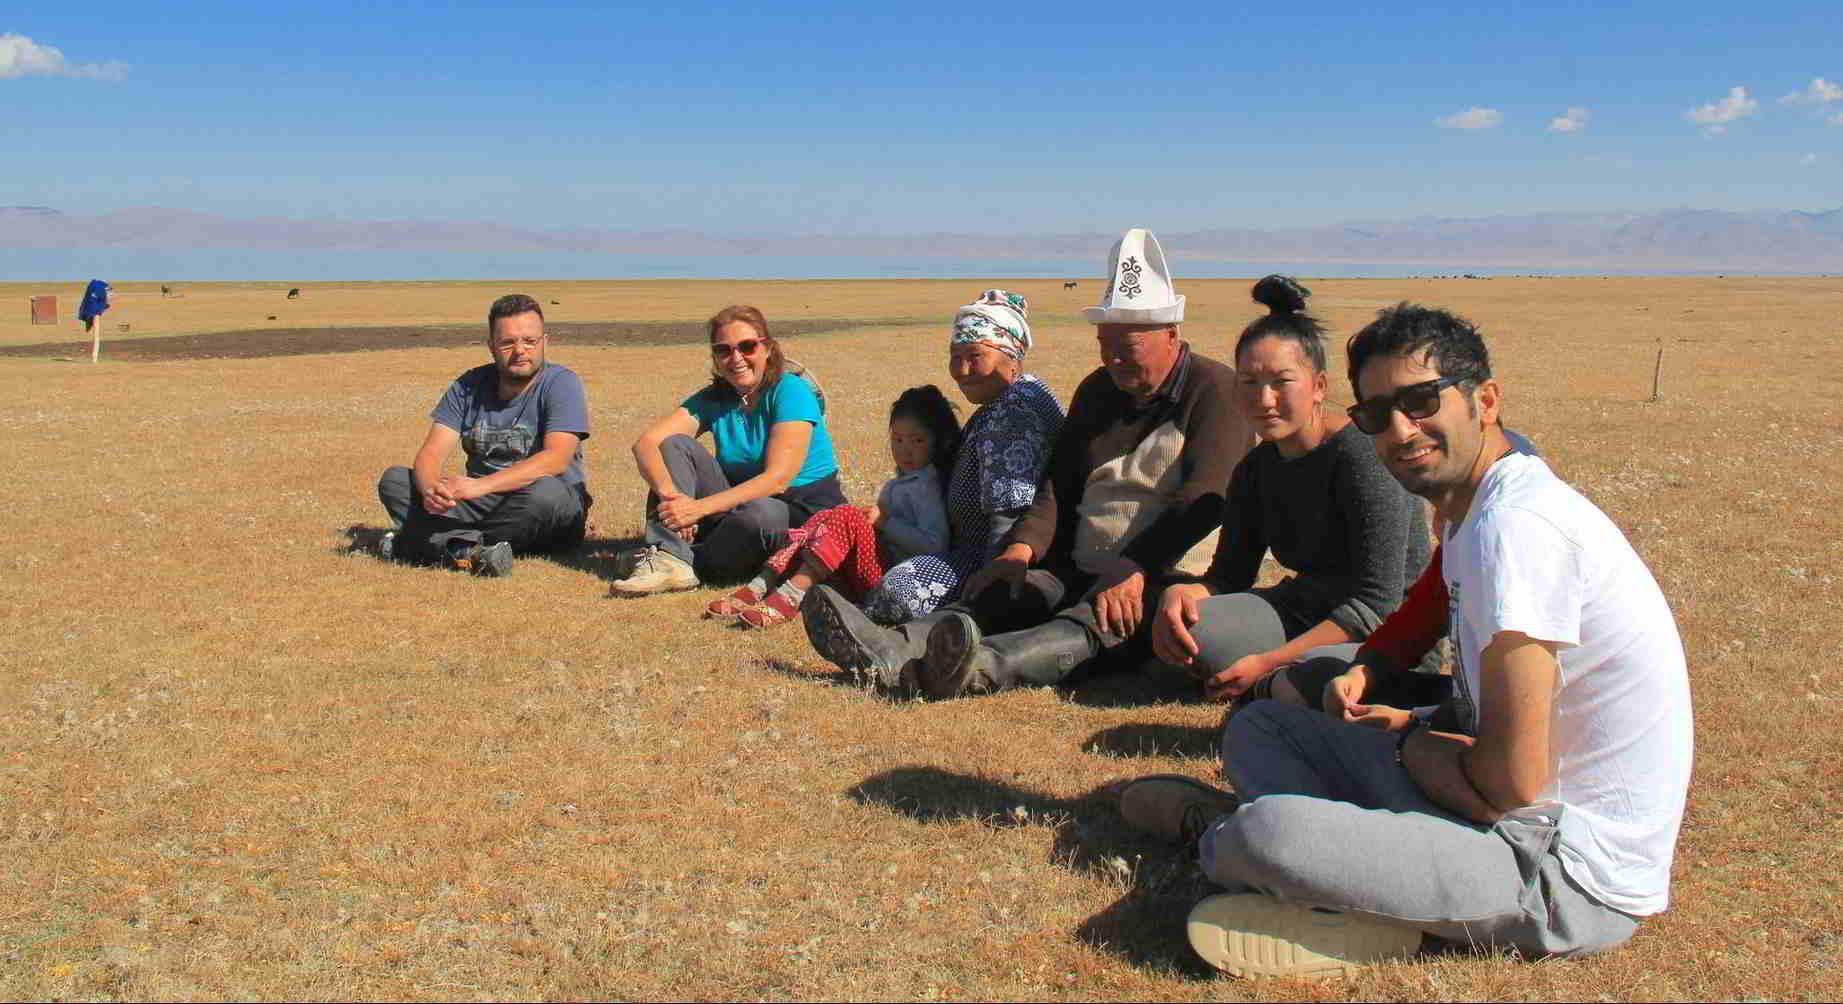 Putovanje-Kirgistan-Planinski-kristal-Centralne-Azije (12)